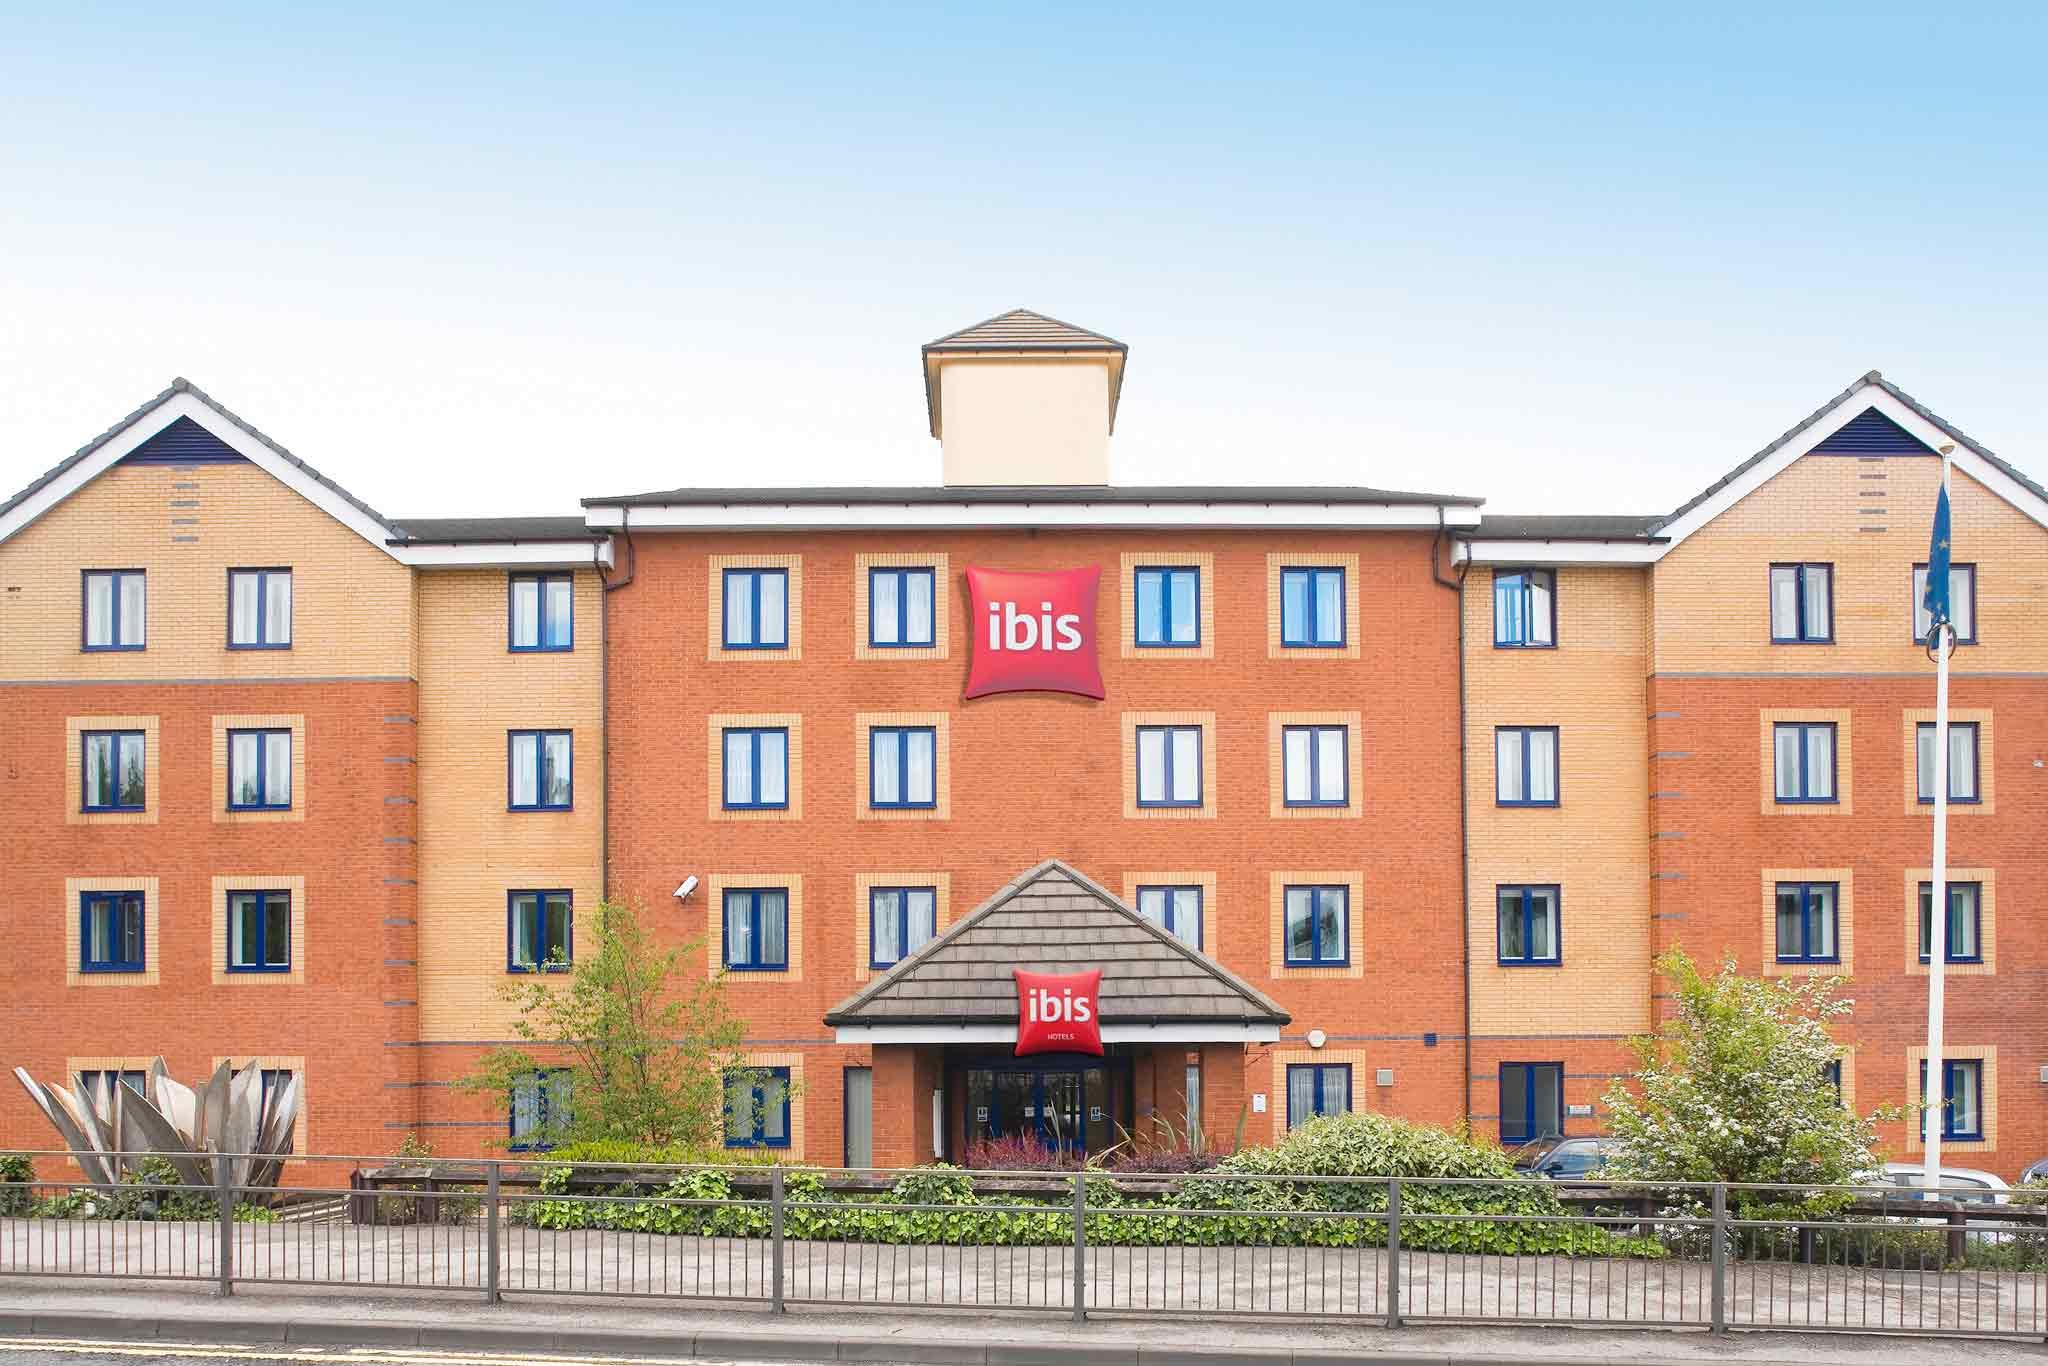 Hotel – ibis Chesterfield Centre - Market Town